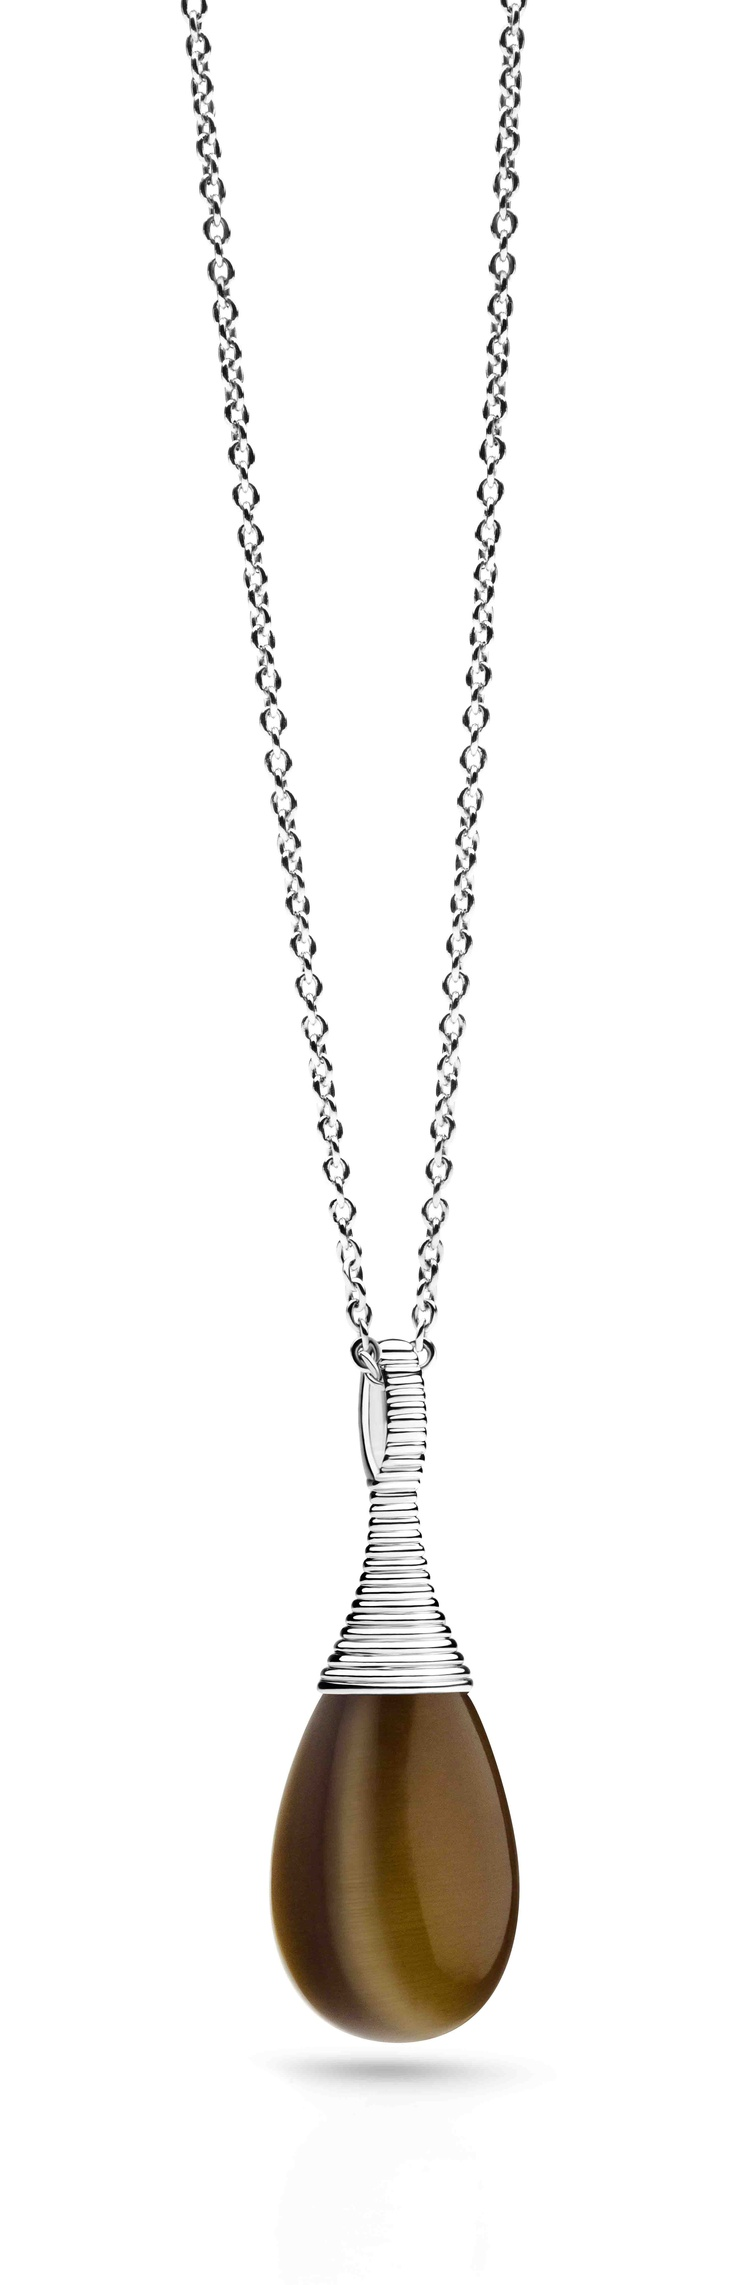 Ti Sento Milano Curve collection necklace and pendant